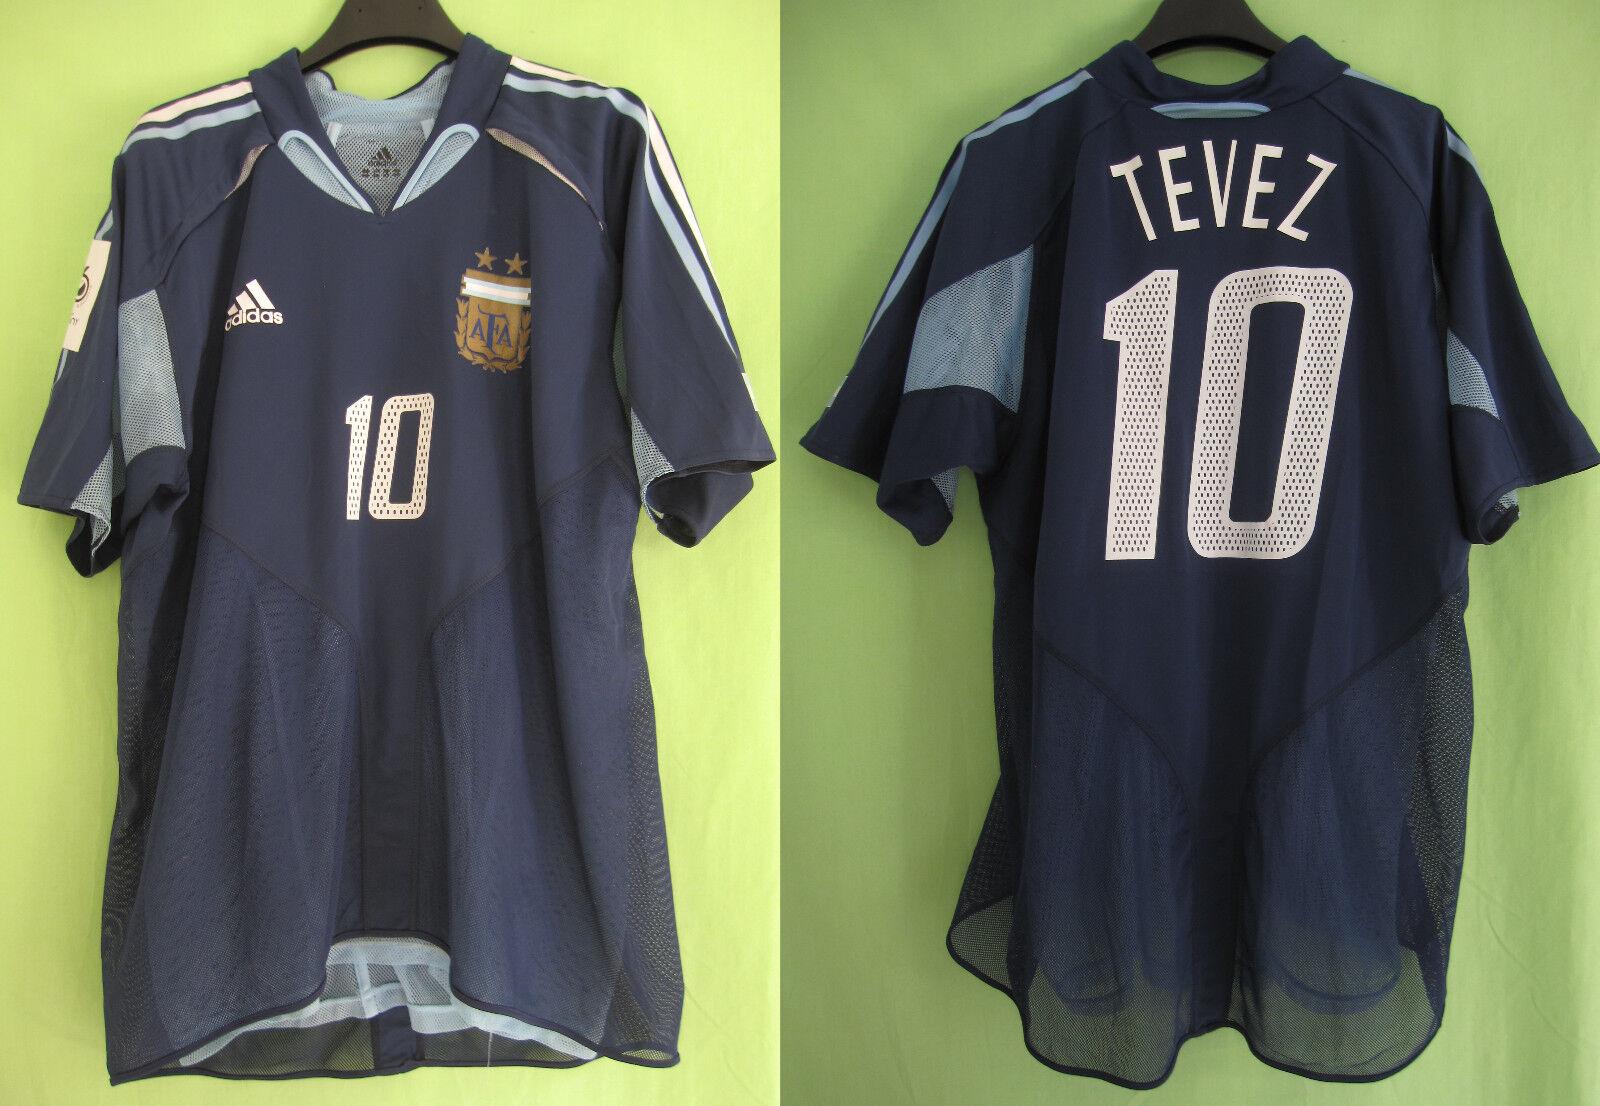 Maillot argentooine Tevez  10 Football Soccer vintage Jersey double couche  XL